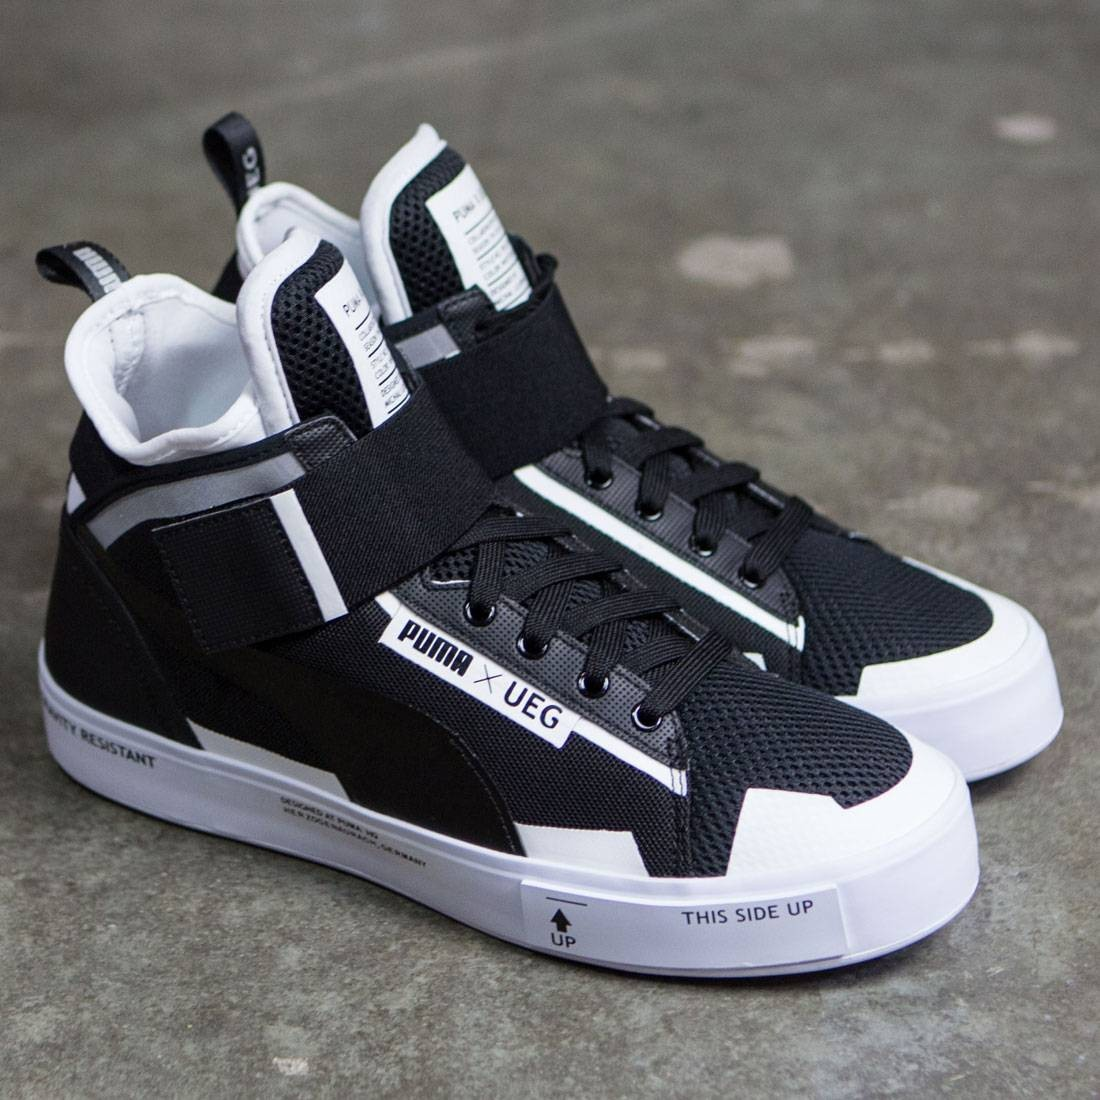 puma for, Puma Puma x UEG hi top sneakers Men Shoes,puma